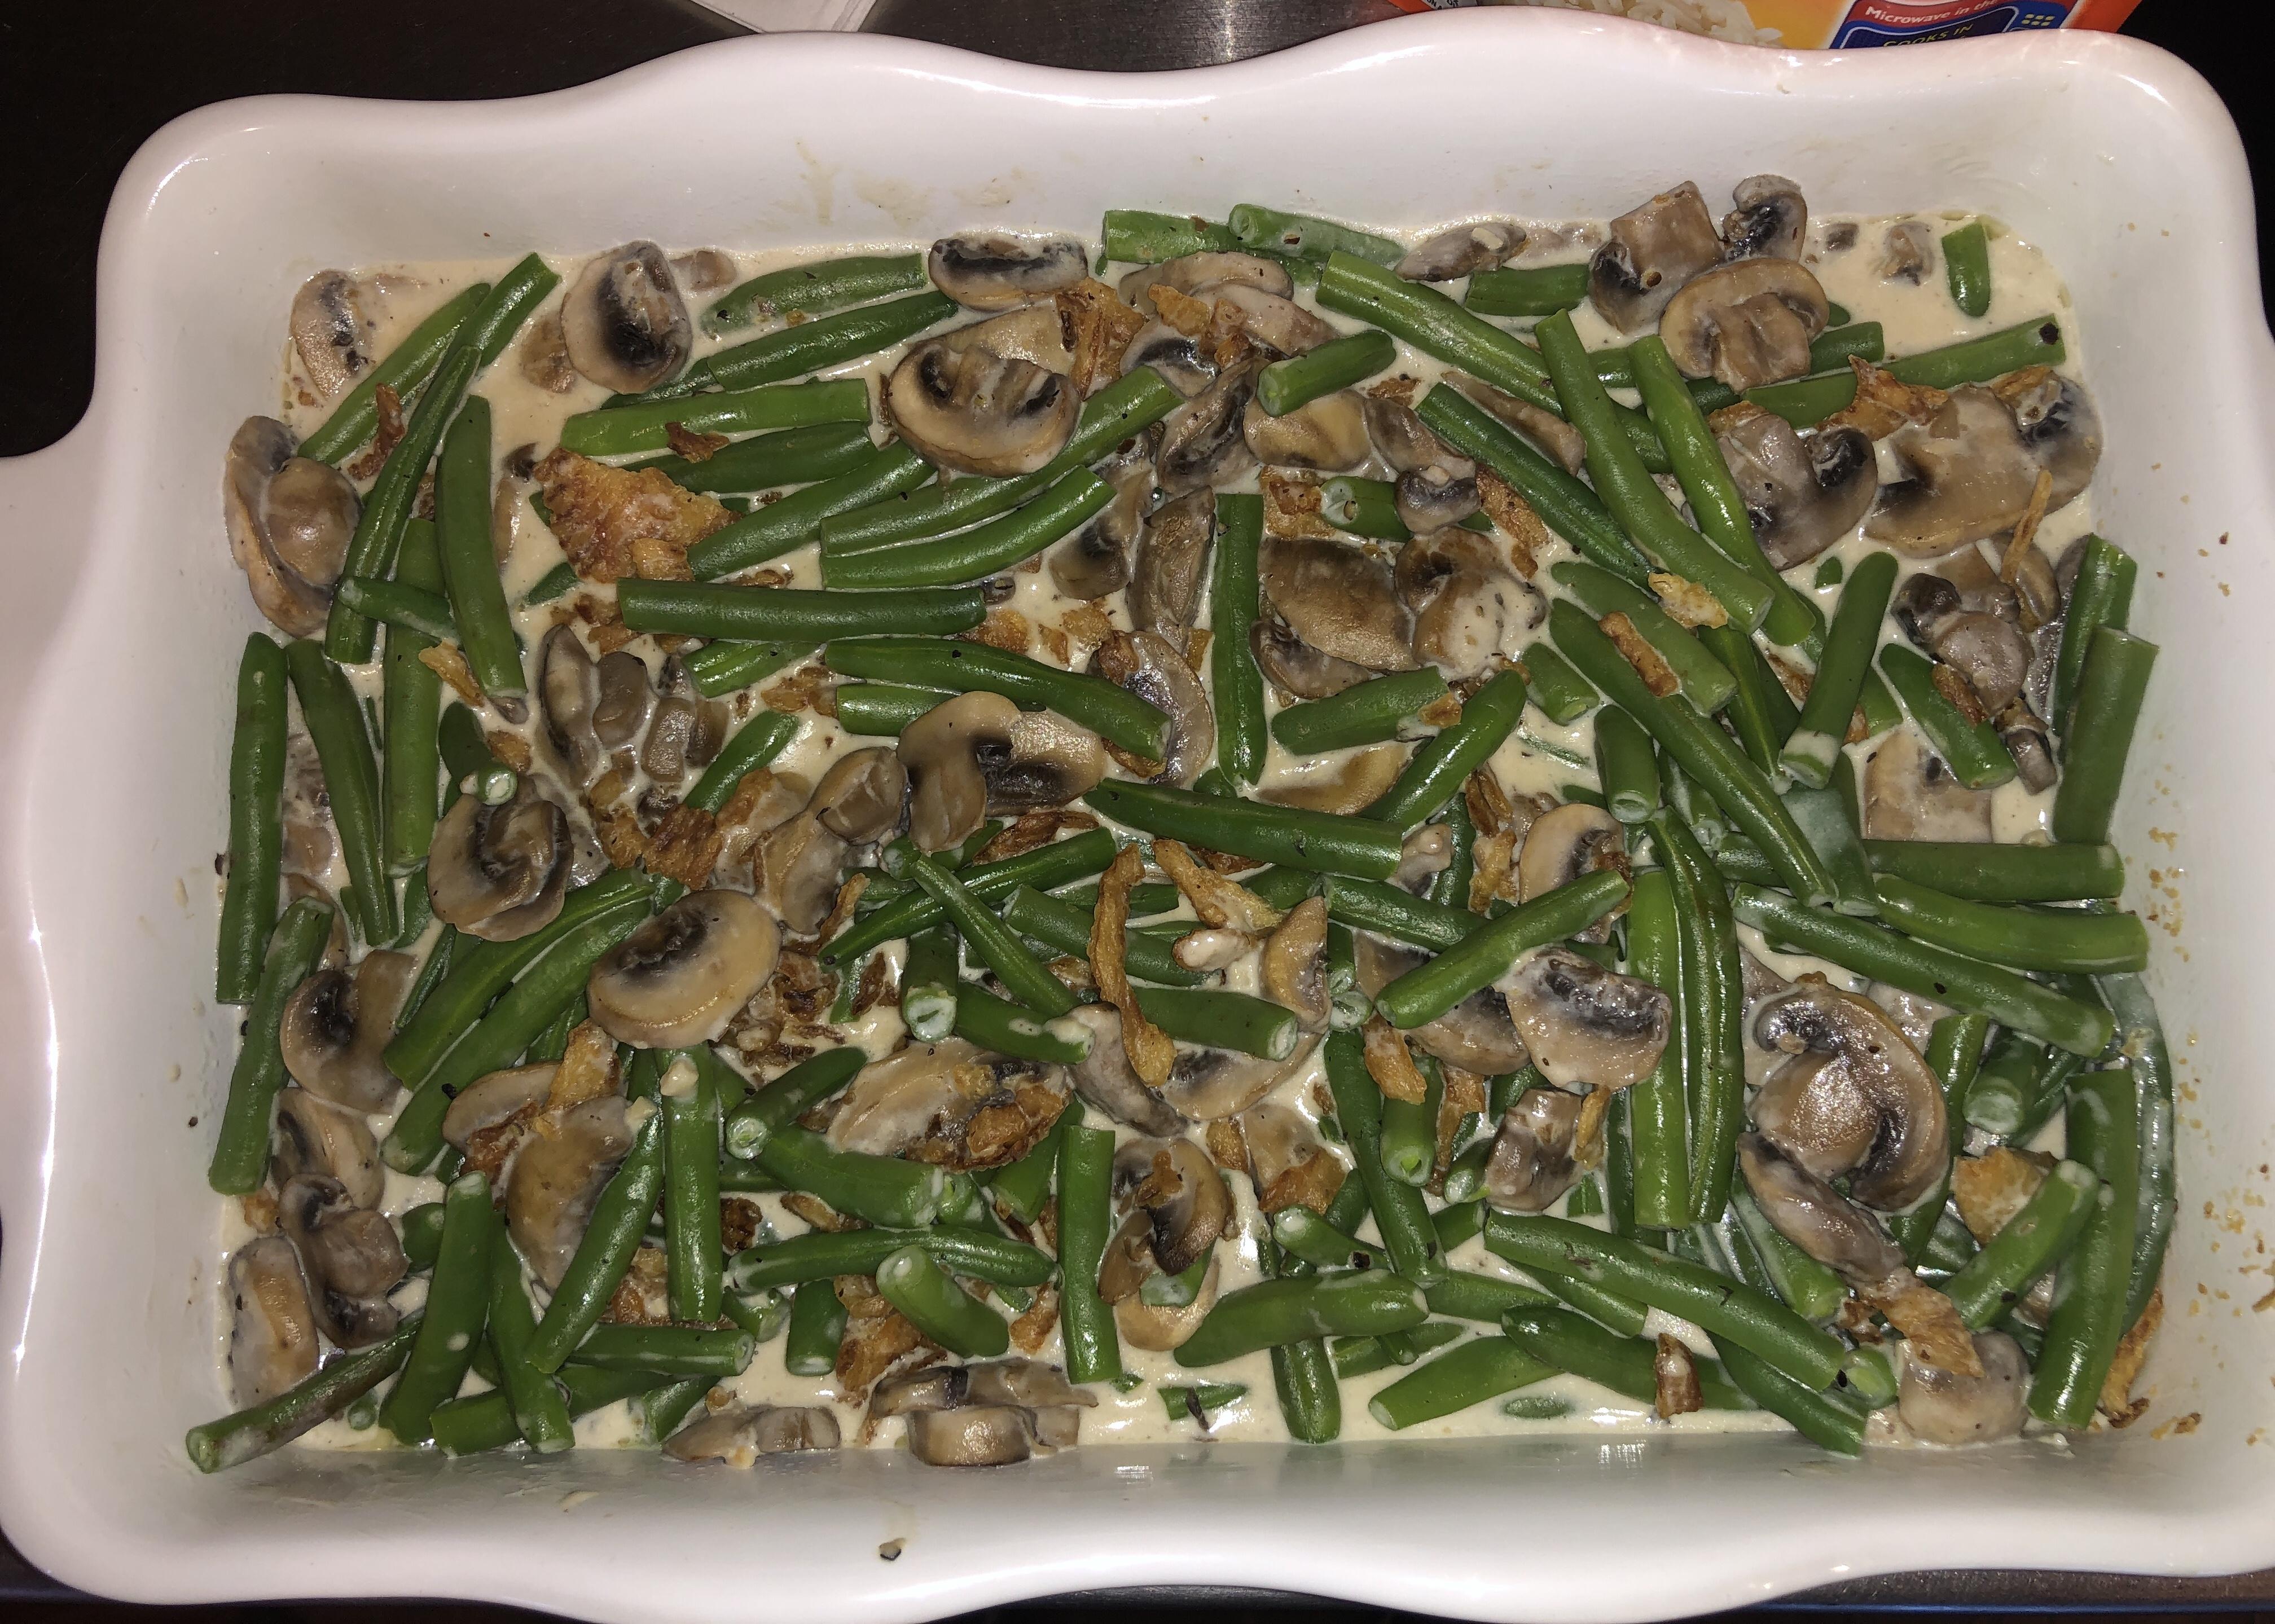 Creamy Roasted Mushroom Soup / Green bean Casserole